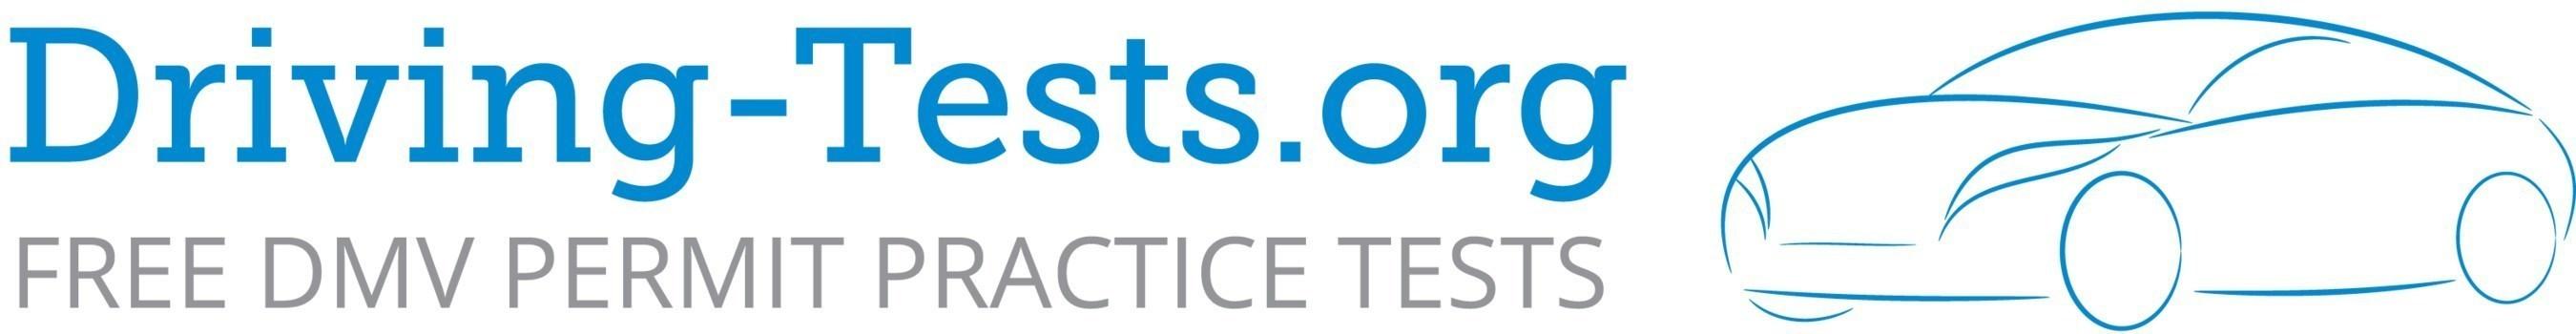 Driving-Tests.org Logo